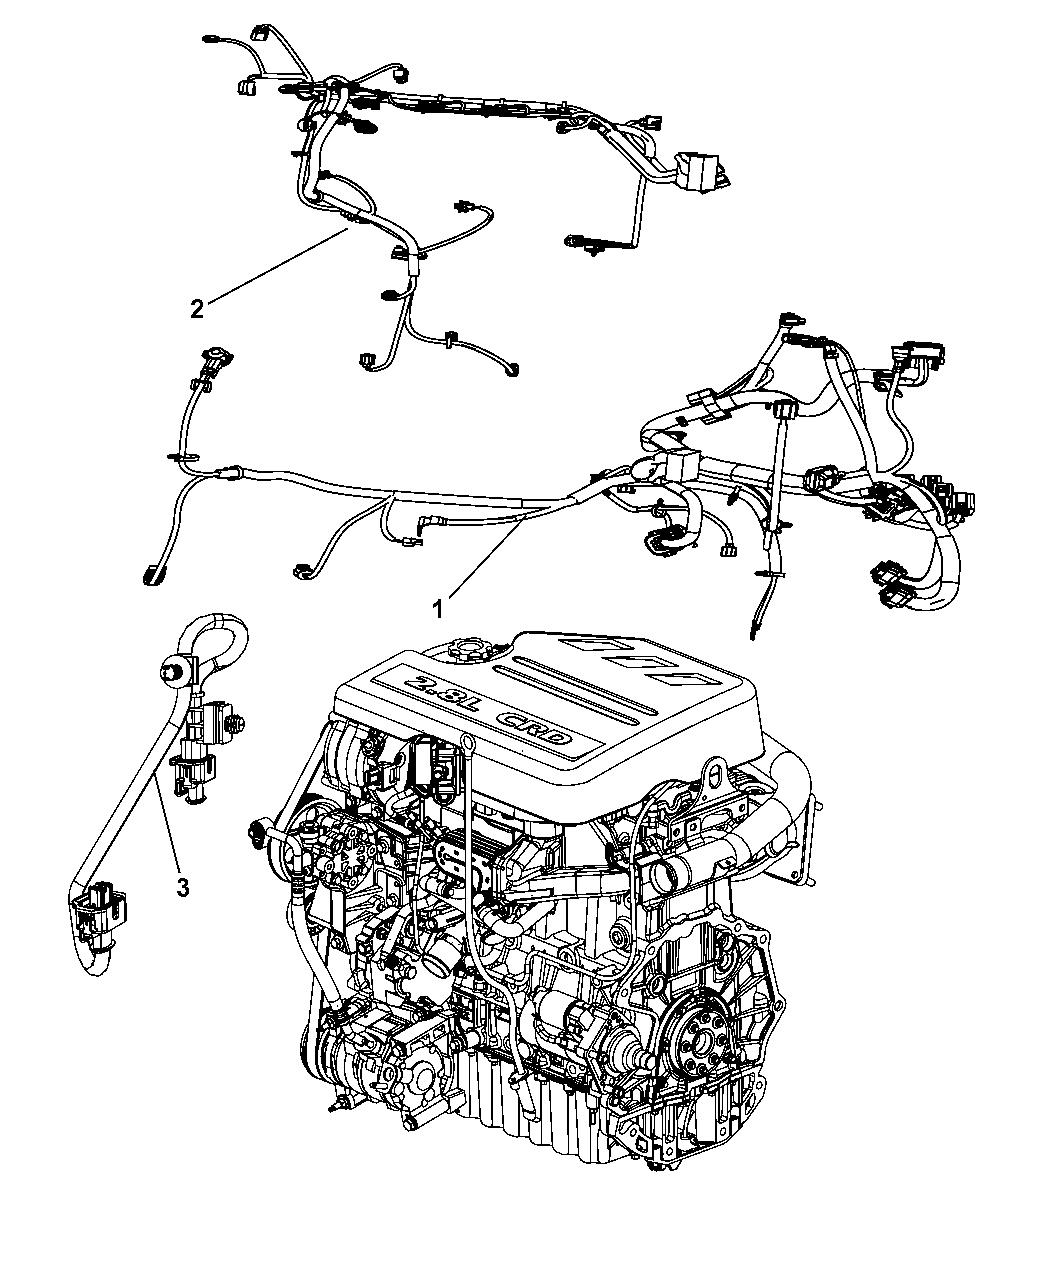 Chrysler Engine Wiring Harnes - Wiring Diagram